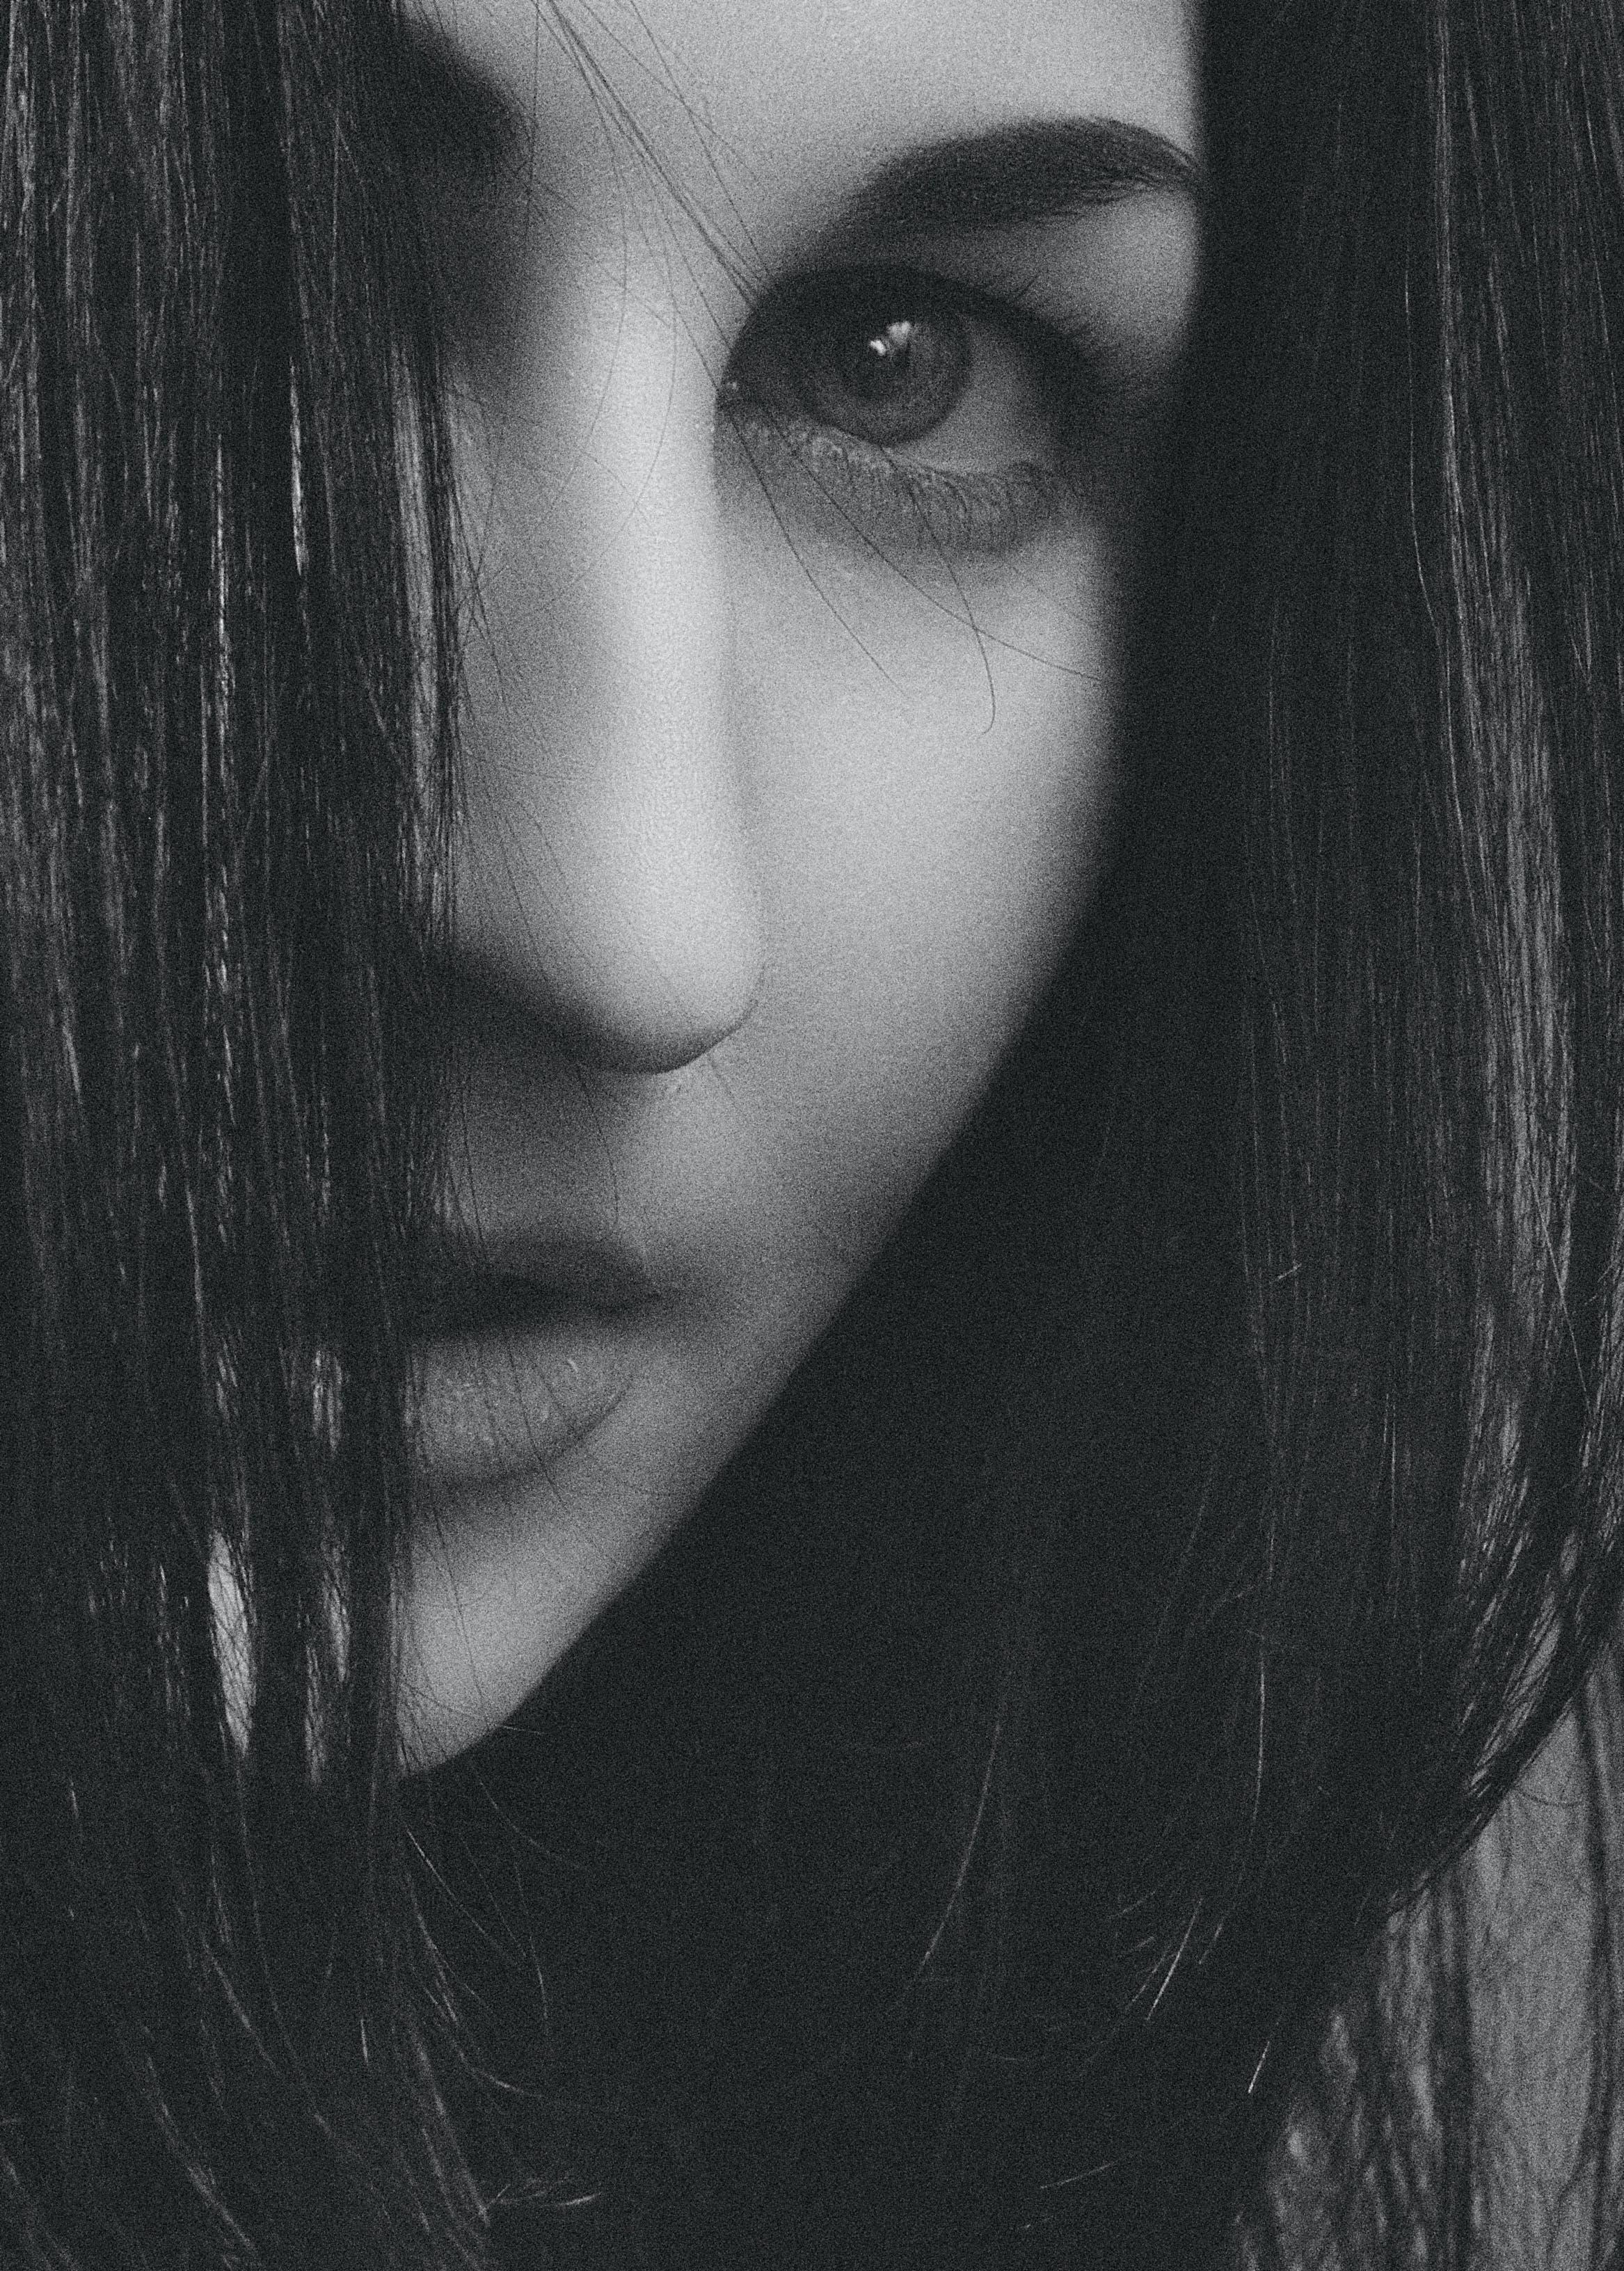 Free stock photo of девушка, портрет, студийный, улыбка